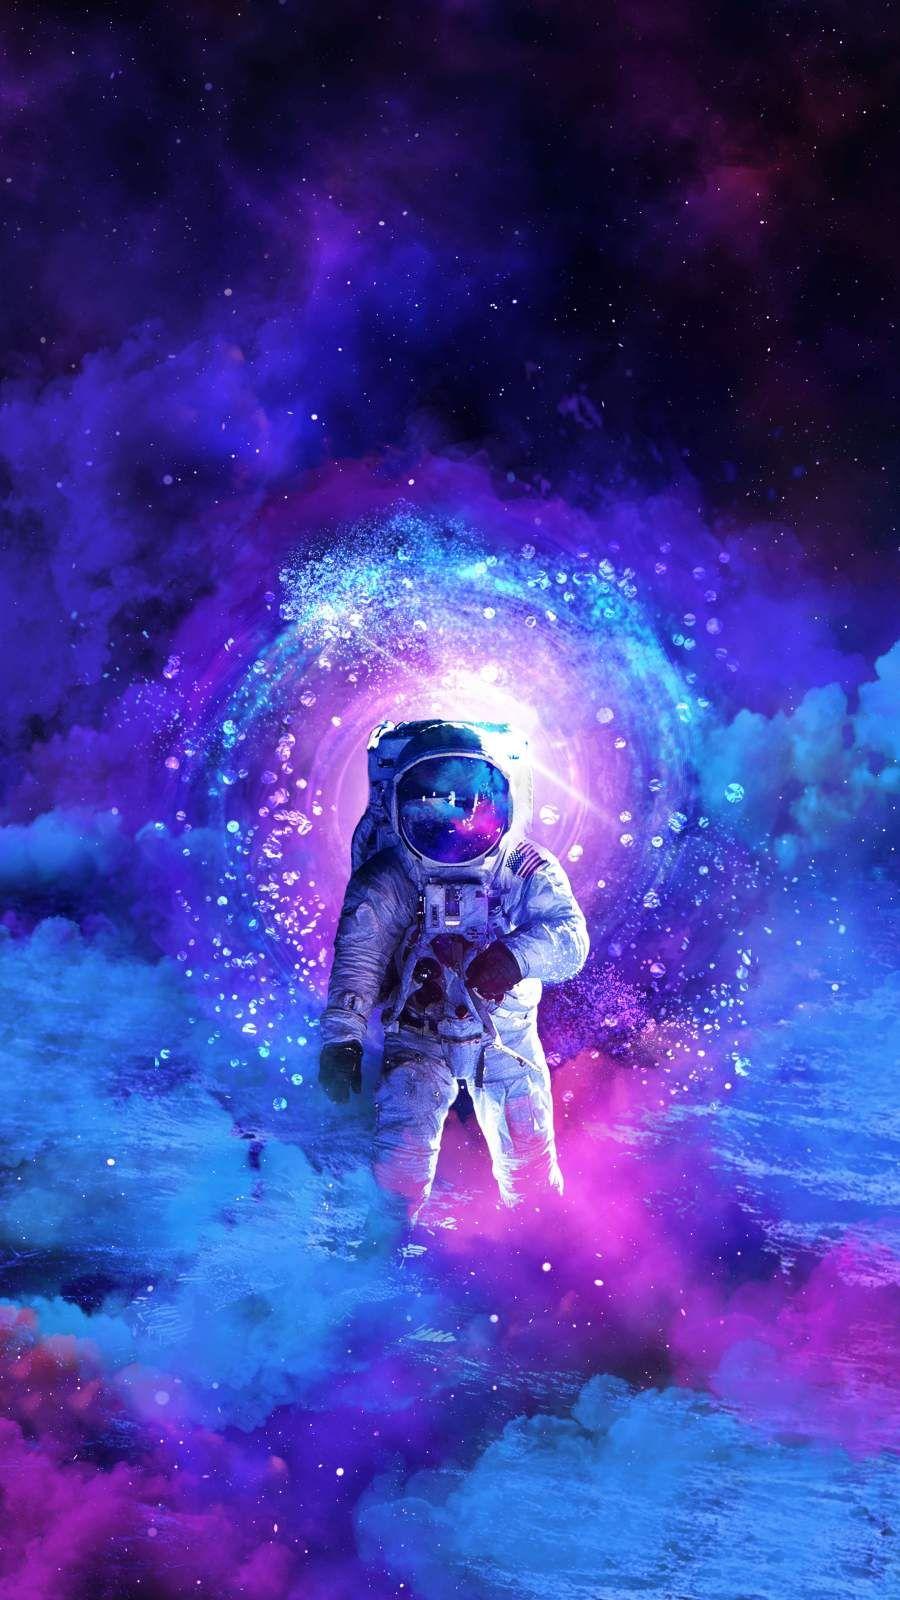 The Cosmonaut Iphone Wallpaper Galaxy Art Astronaut Wallpaper Space Artwork